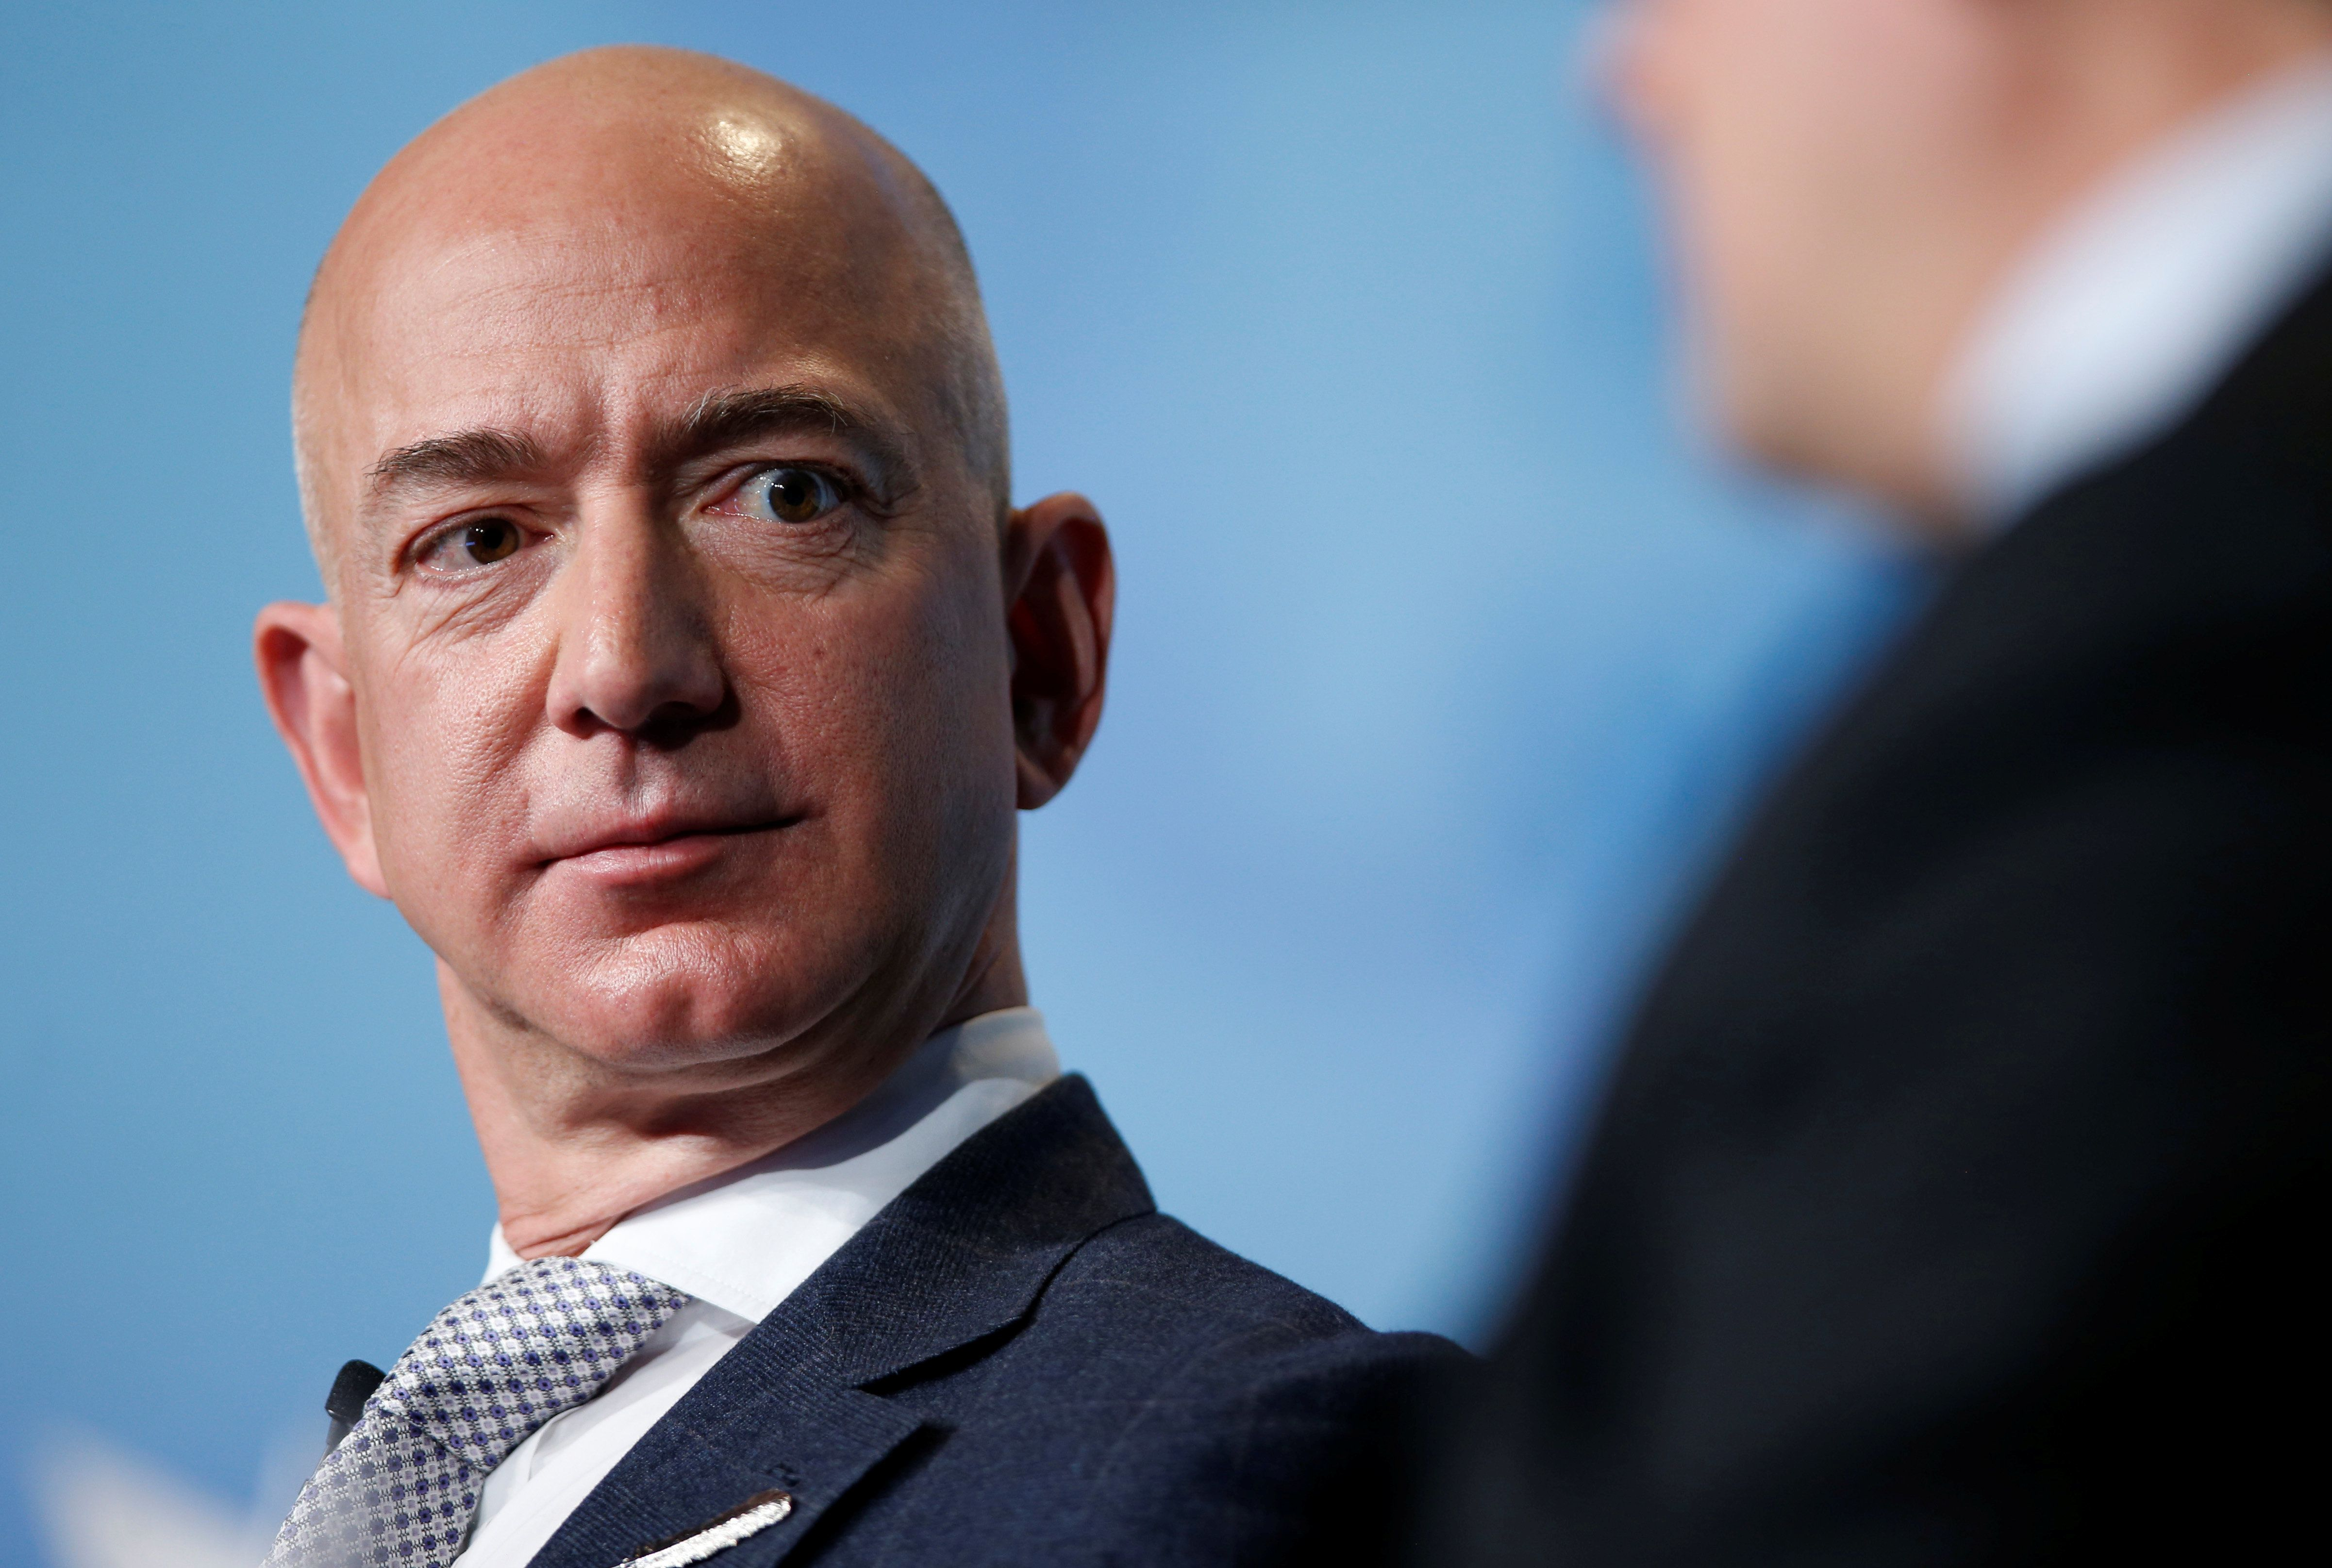 O Jeff Bezos εξήγησε το πλάνο του να αποικίσει στο φεγγάρι: «Να κάνουμε αποικία στη Σελήνη. Η Γη δεν είναι καλό μέρος για βαρ...